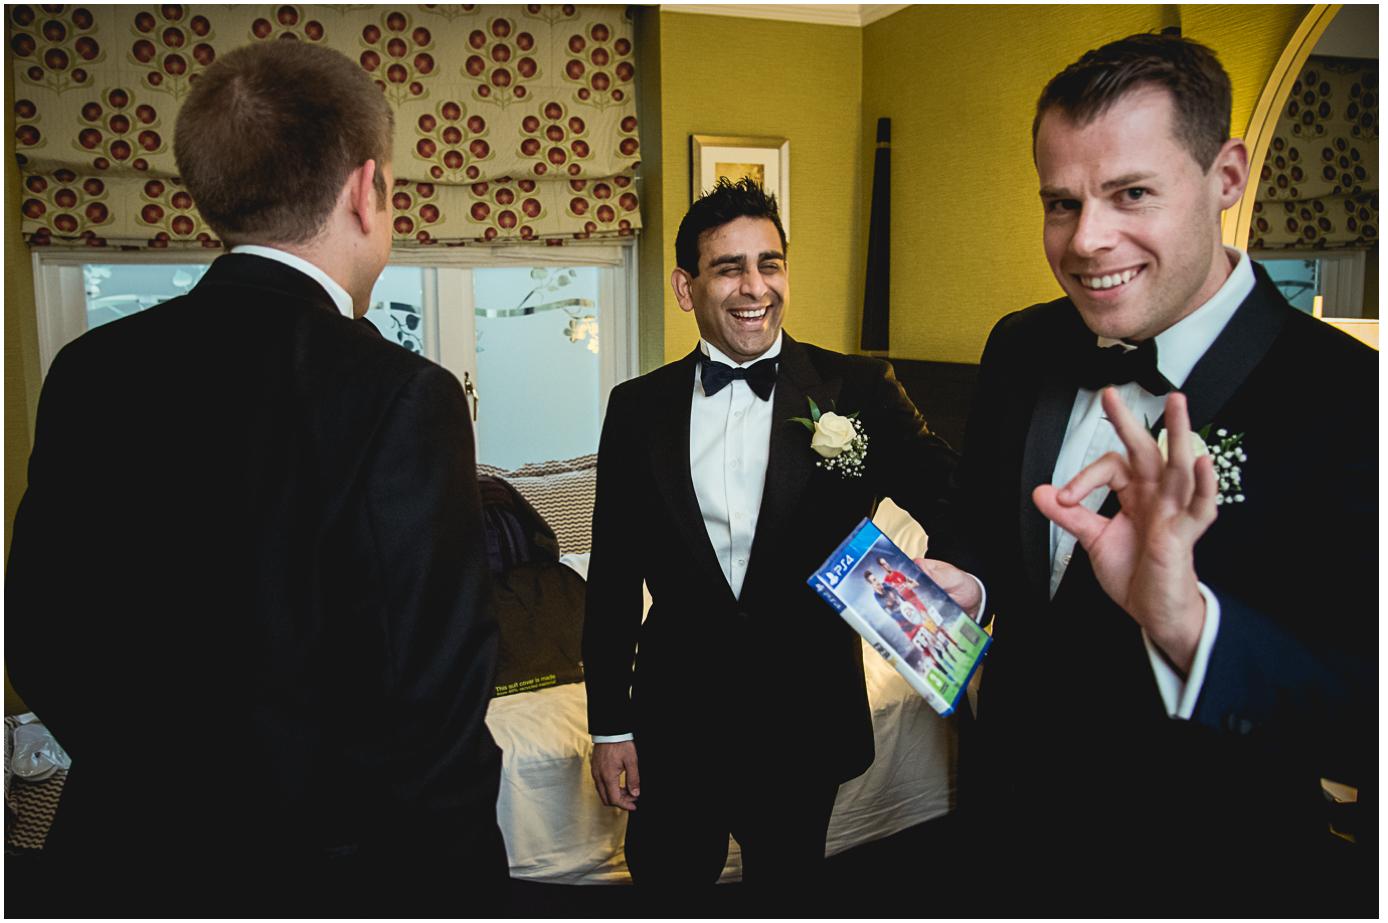 14 - Esmat and Angus - St. Ermin's Hotel London wedding photographer